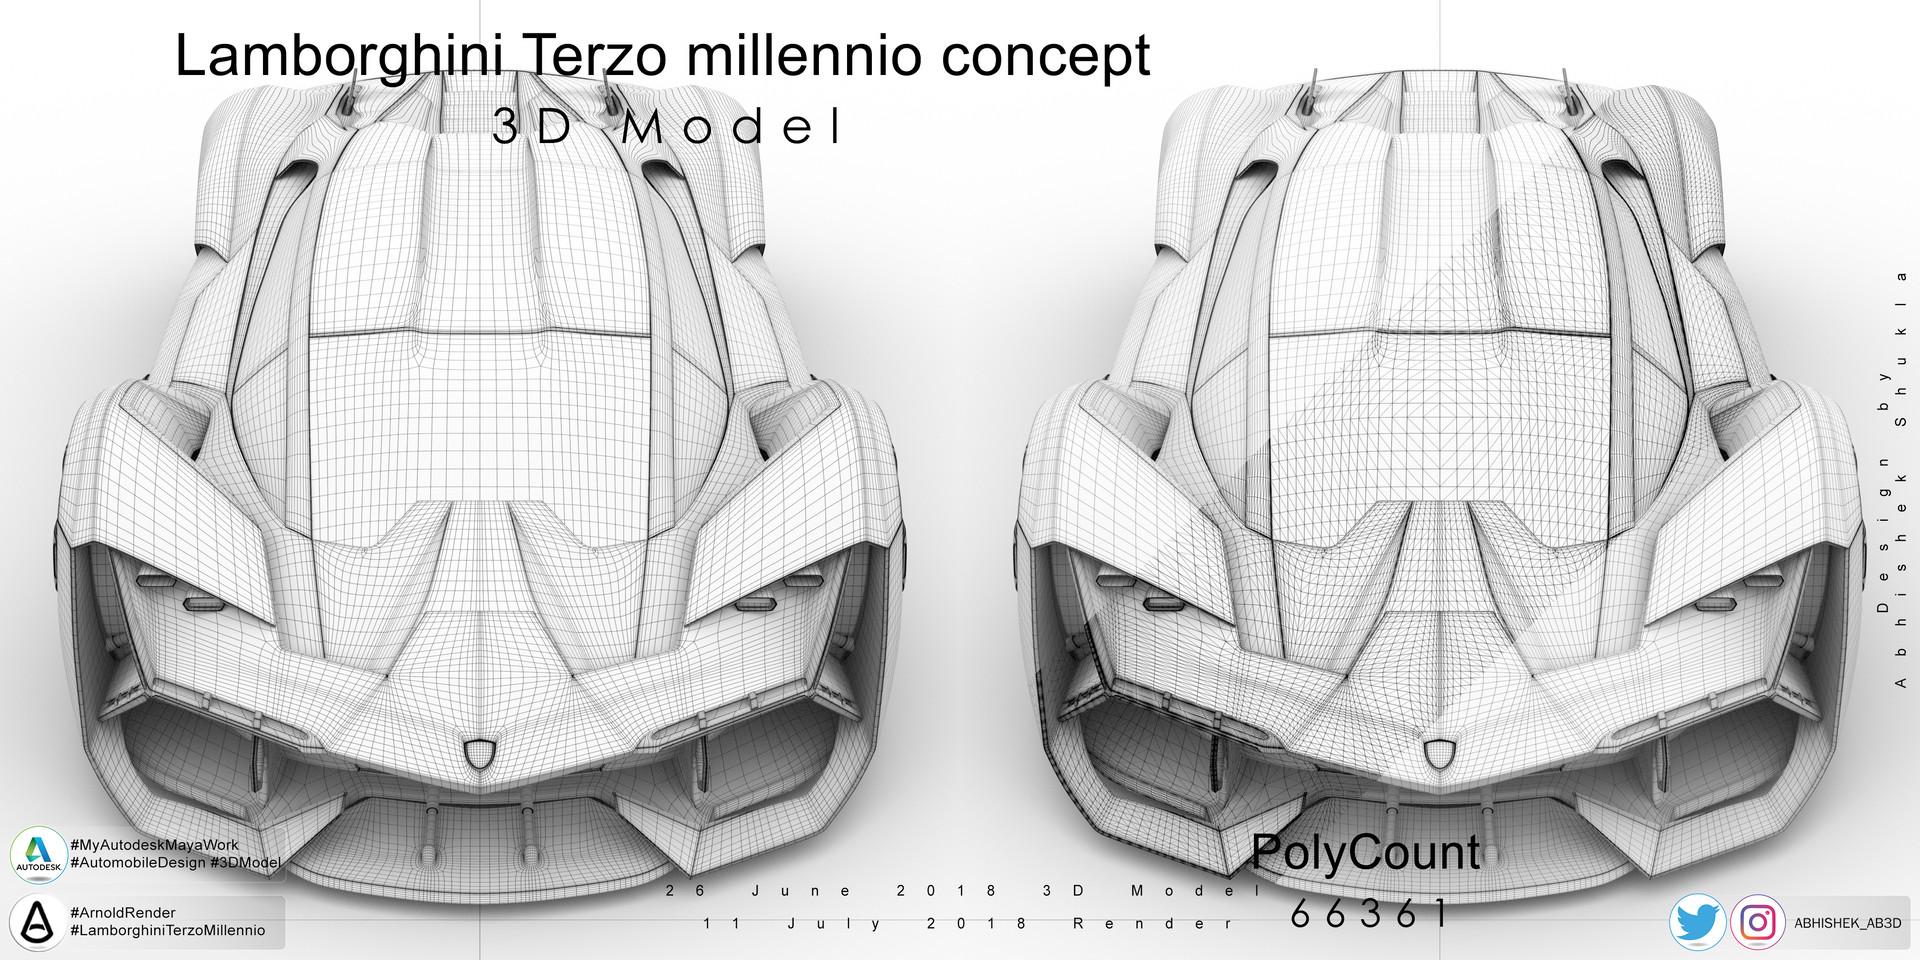 hight resolution of artstation lamborghini terzo millennio 3d model abhishek shukla car 3d diagram